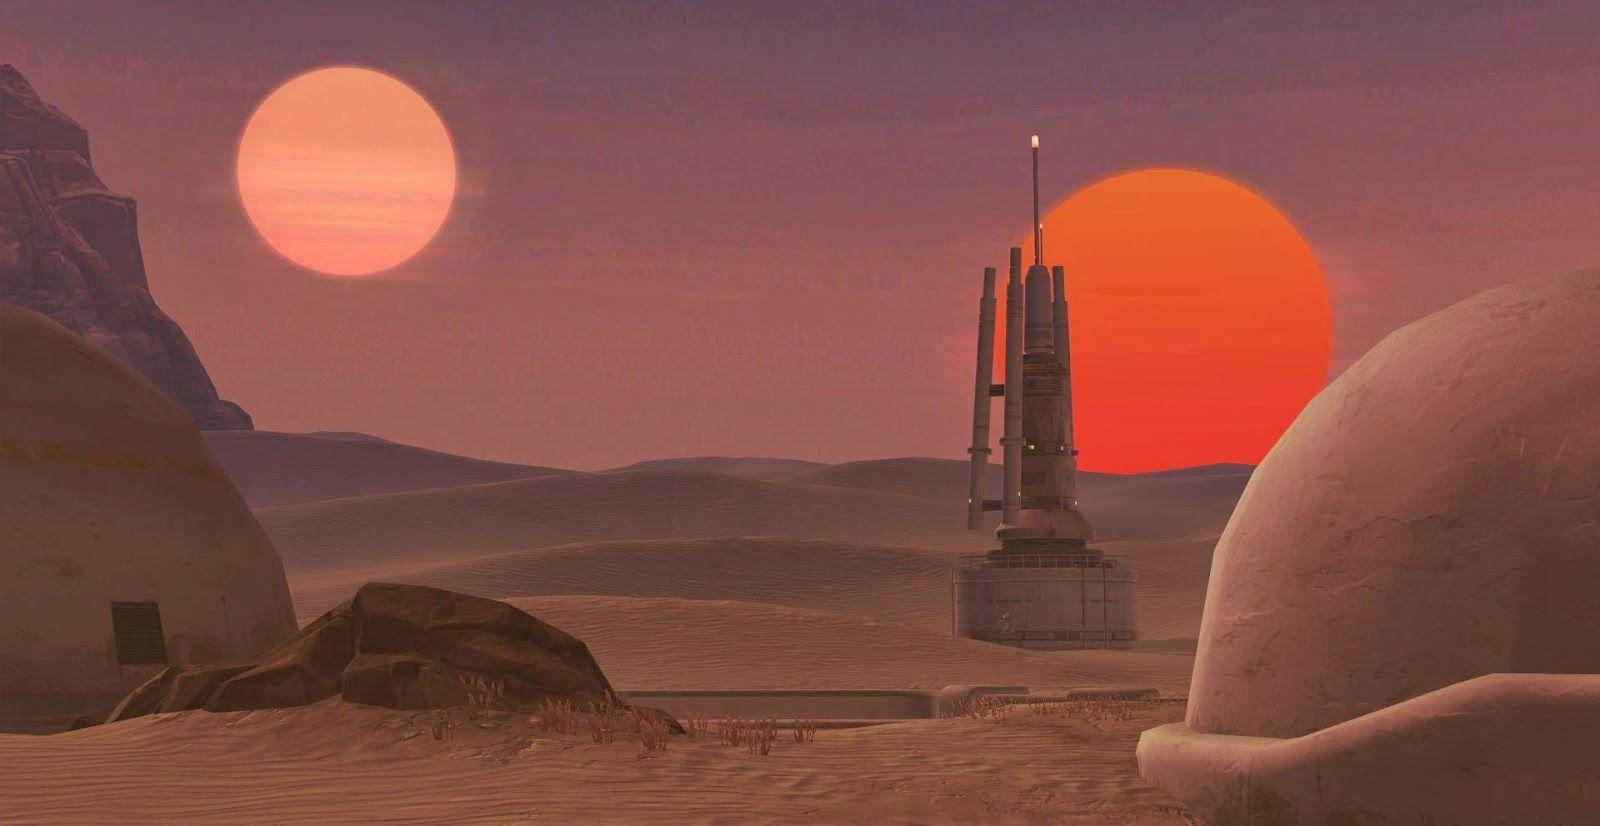 Star Wars Rebel Wallpaper Iphone Tatooine Sunset Google Search Neu Drab Star Wars